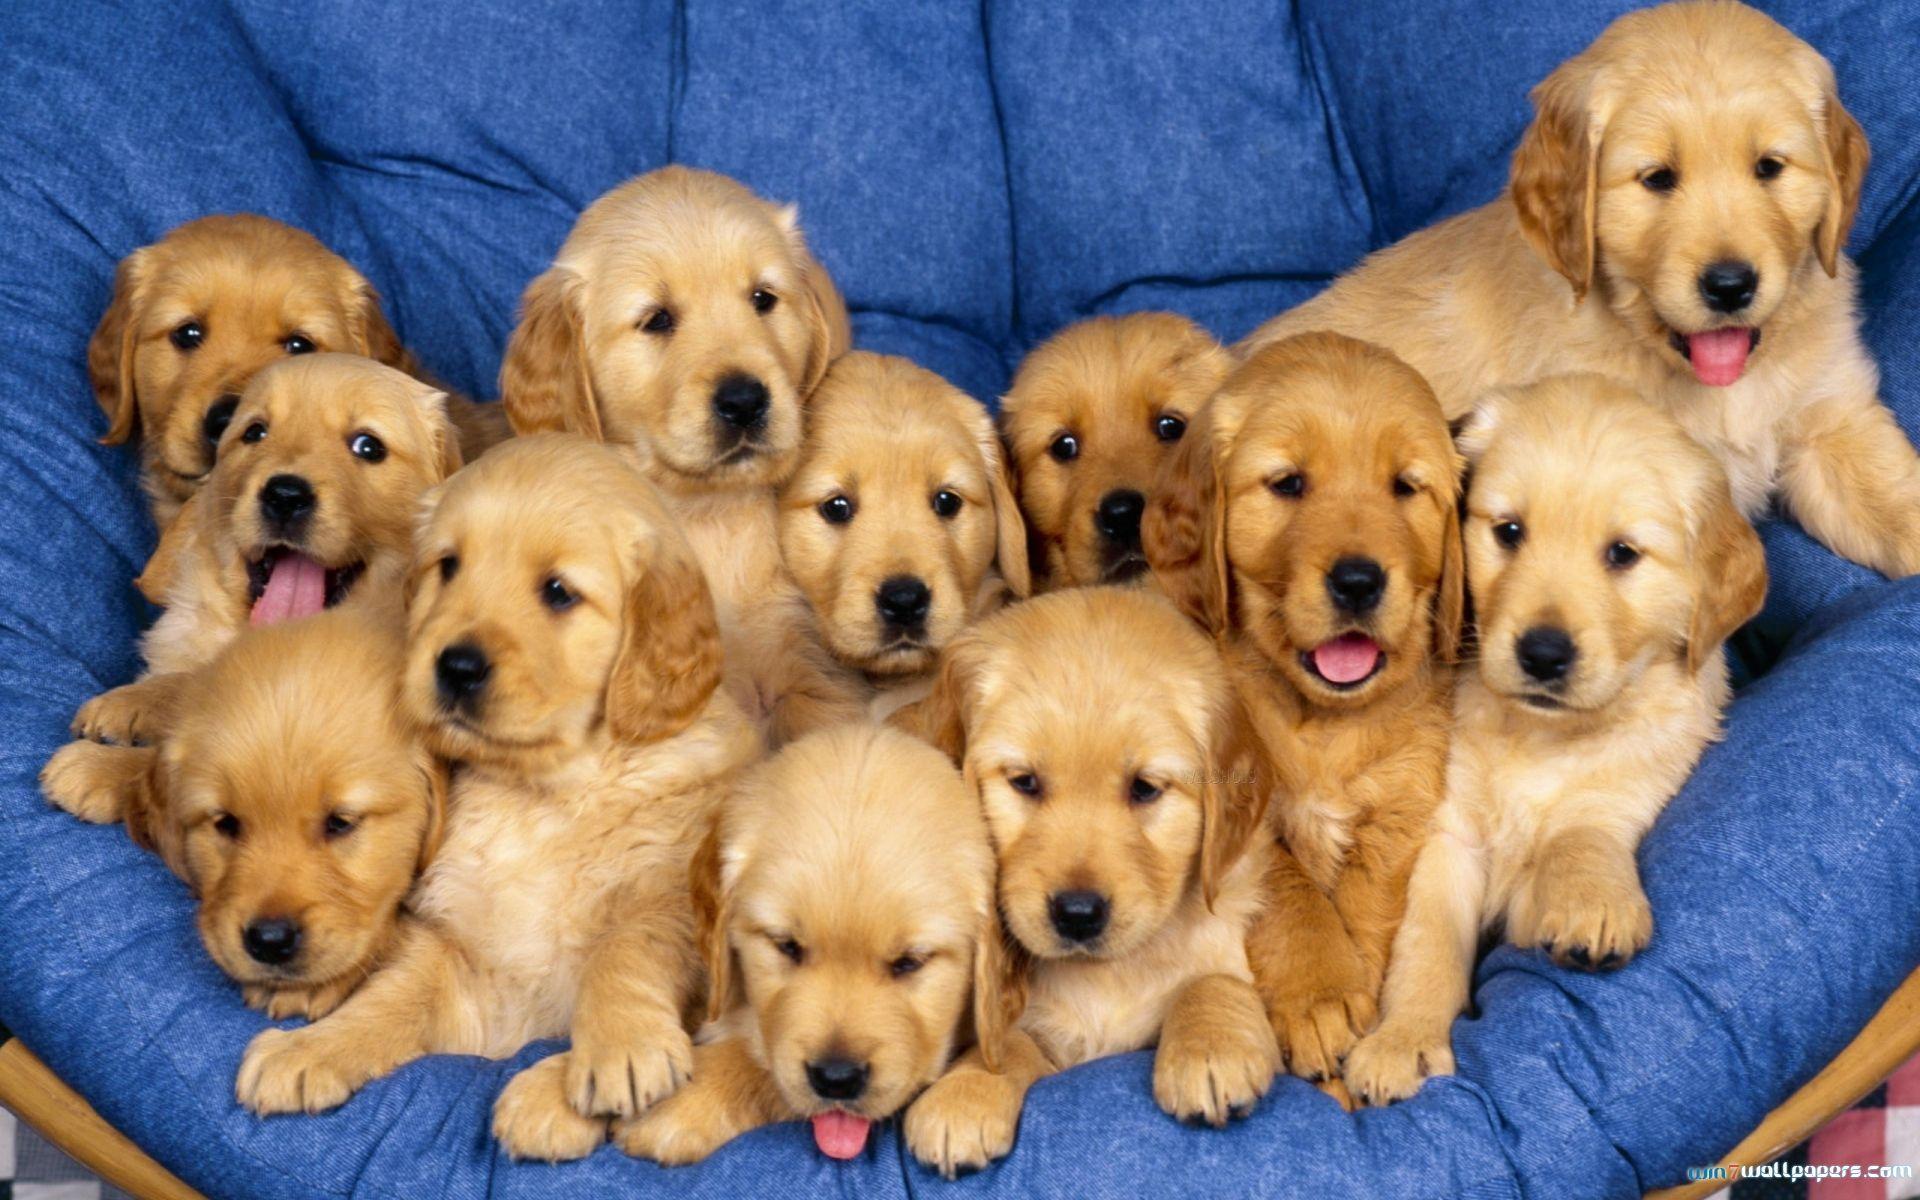 Https Www Tumblr Com Blog Muny Retriever Puppy Puppies